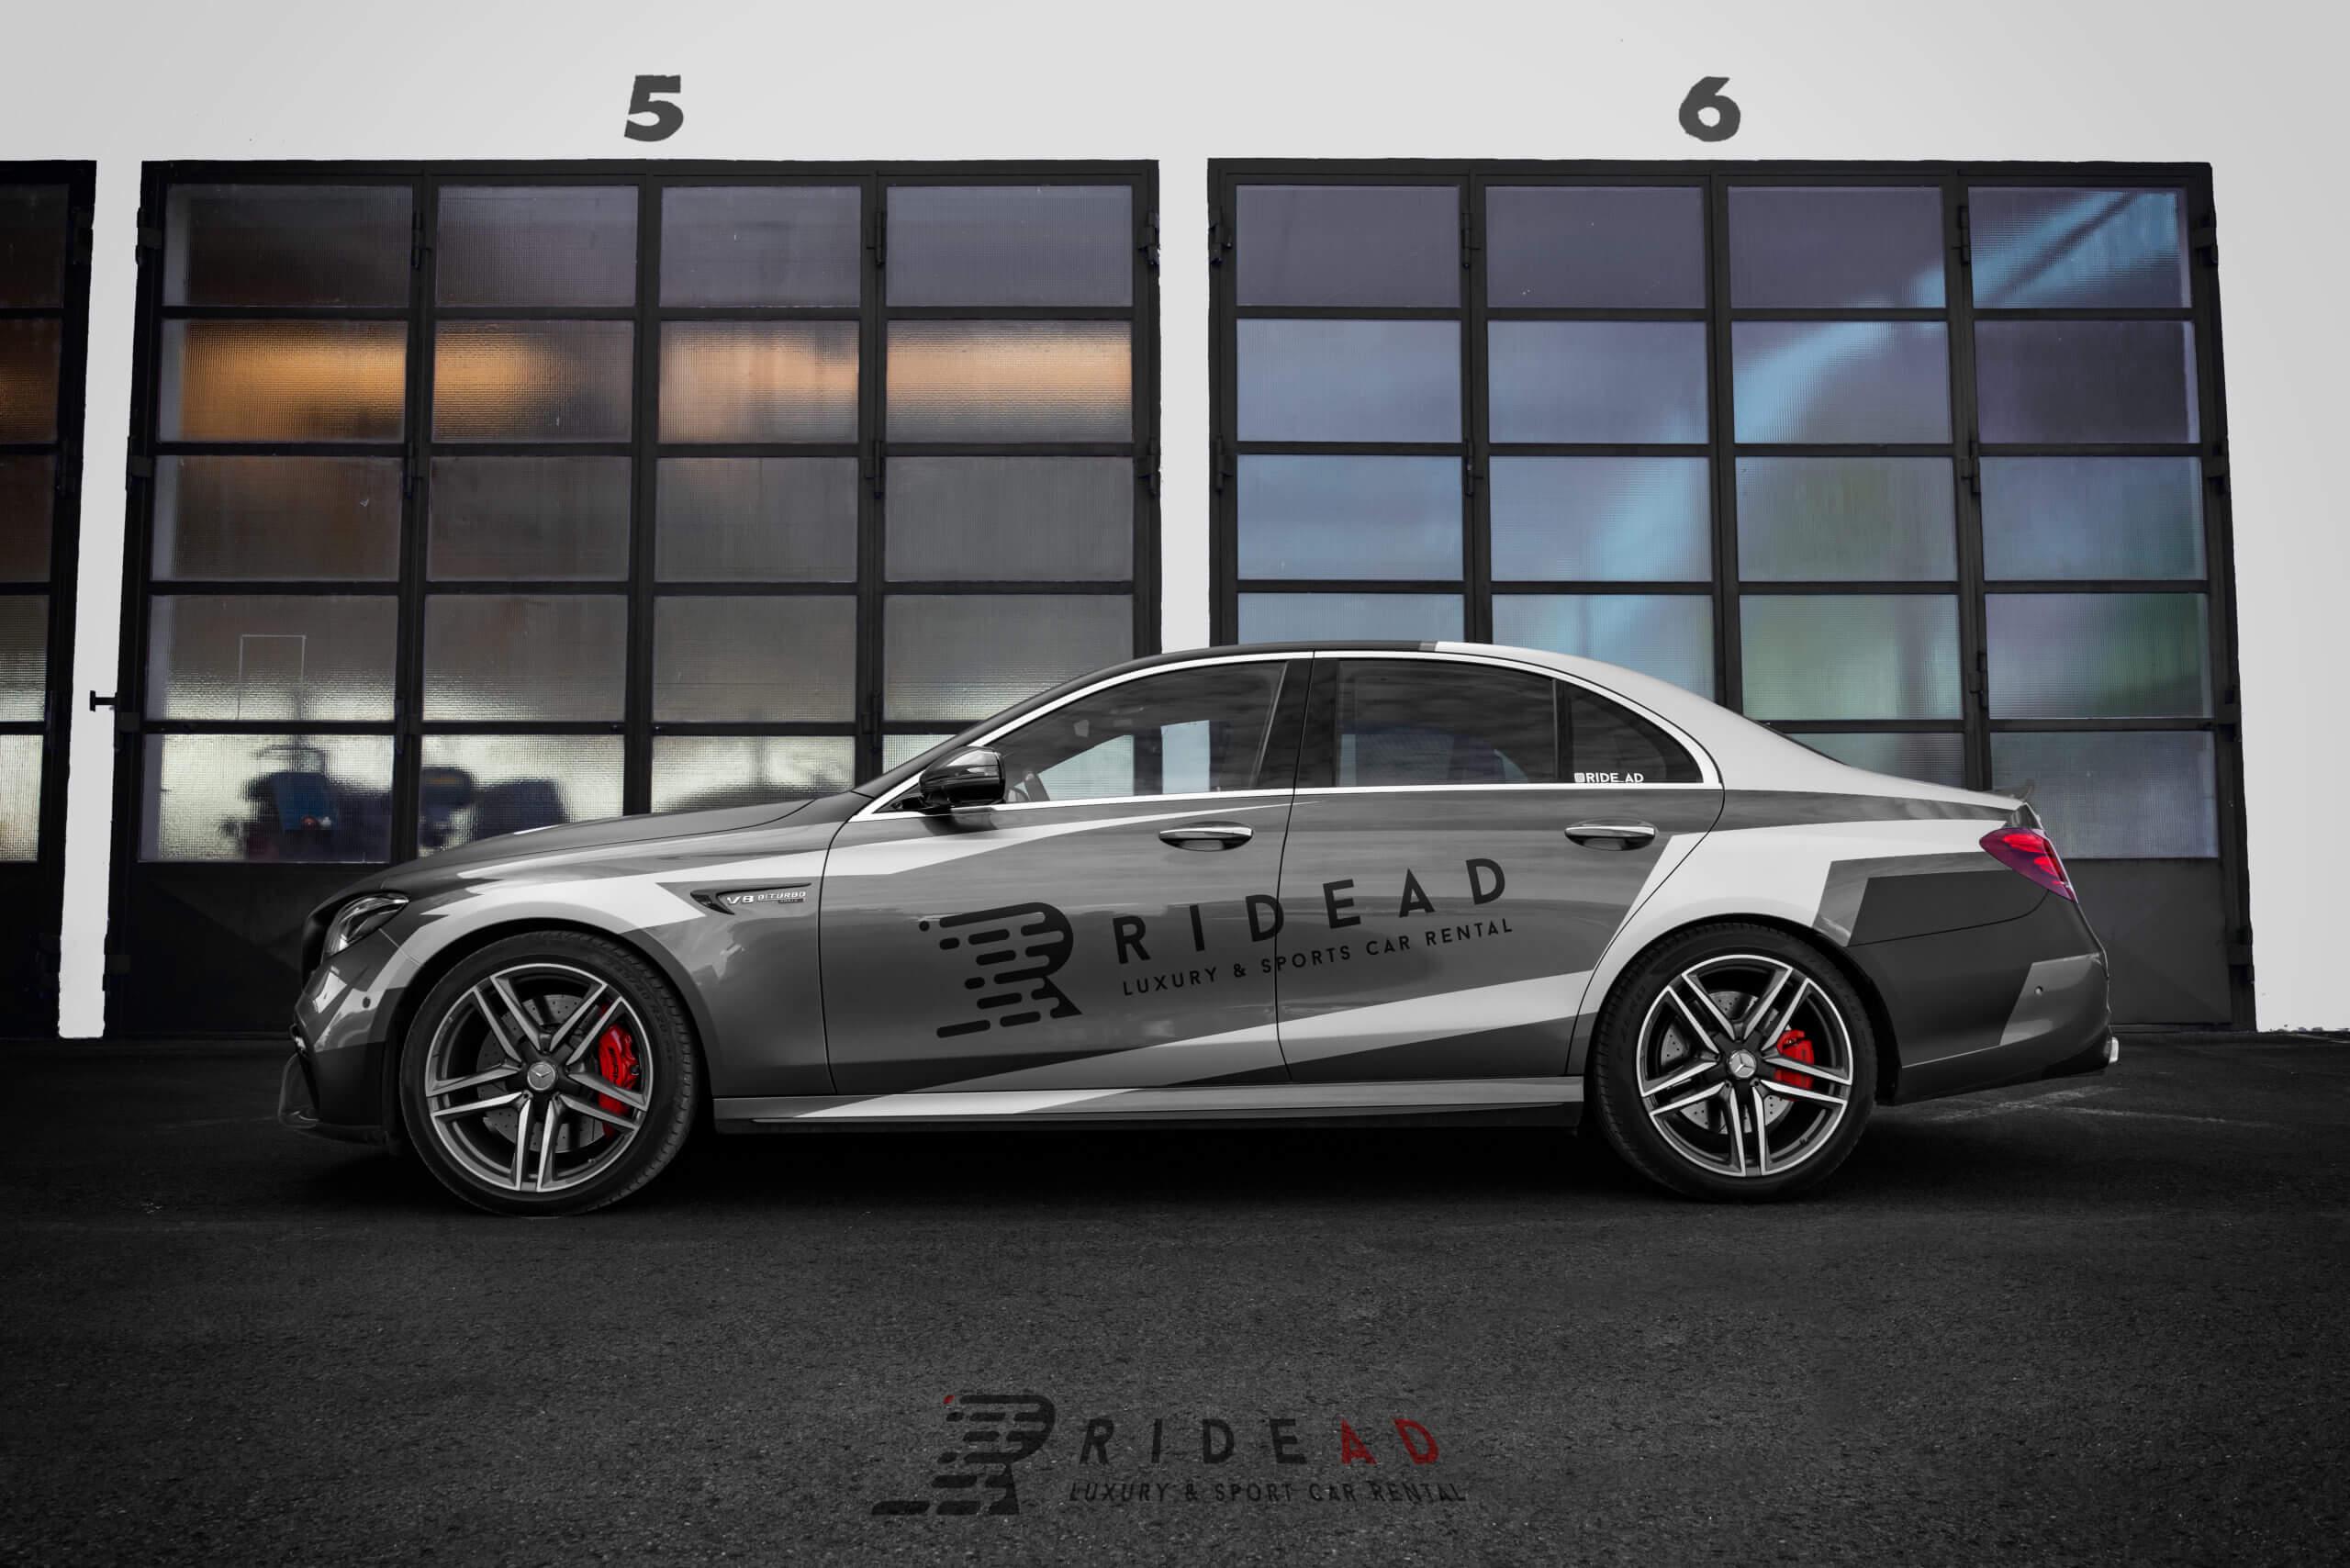 Ride Ad Luxury and Sports Car Rental - Mercedes-Benz E63 s AMG Kurzzeitmiete 1